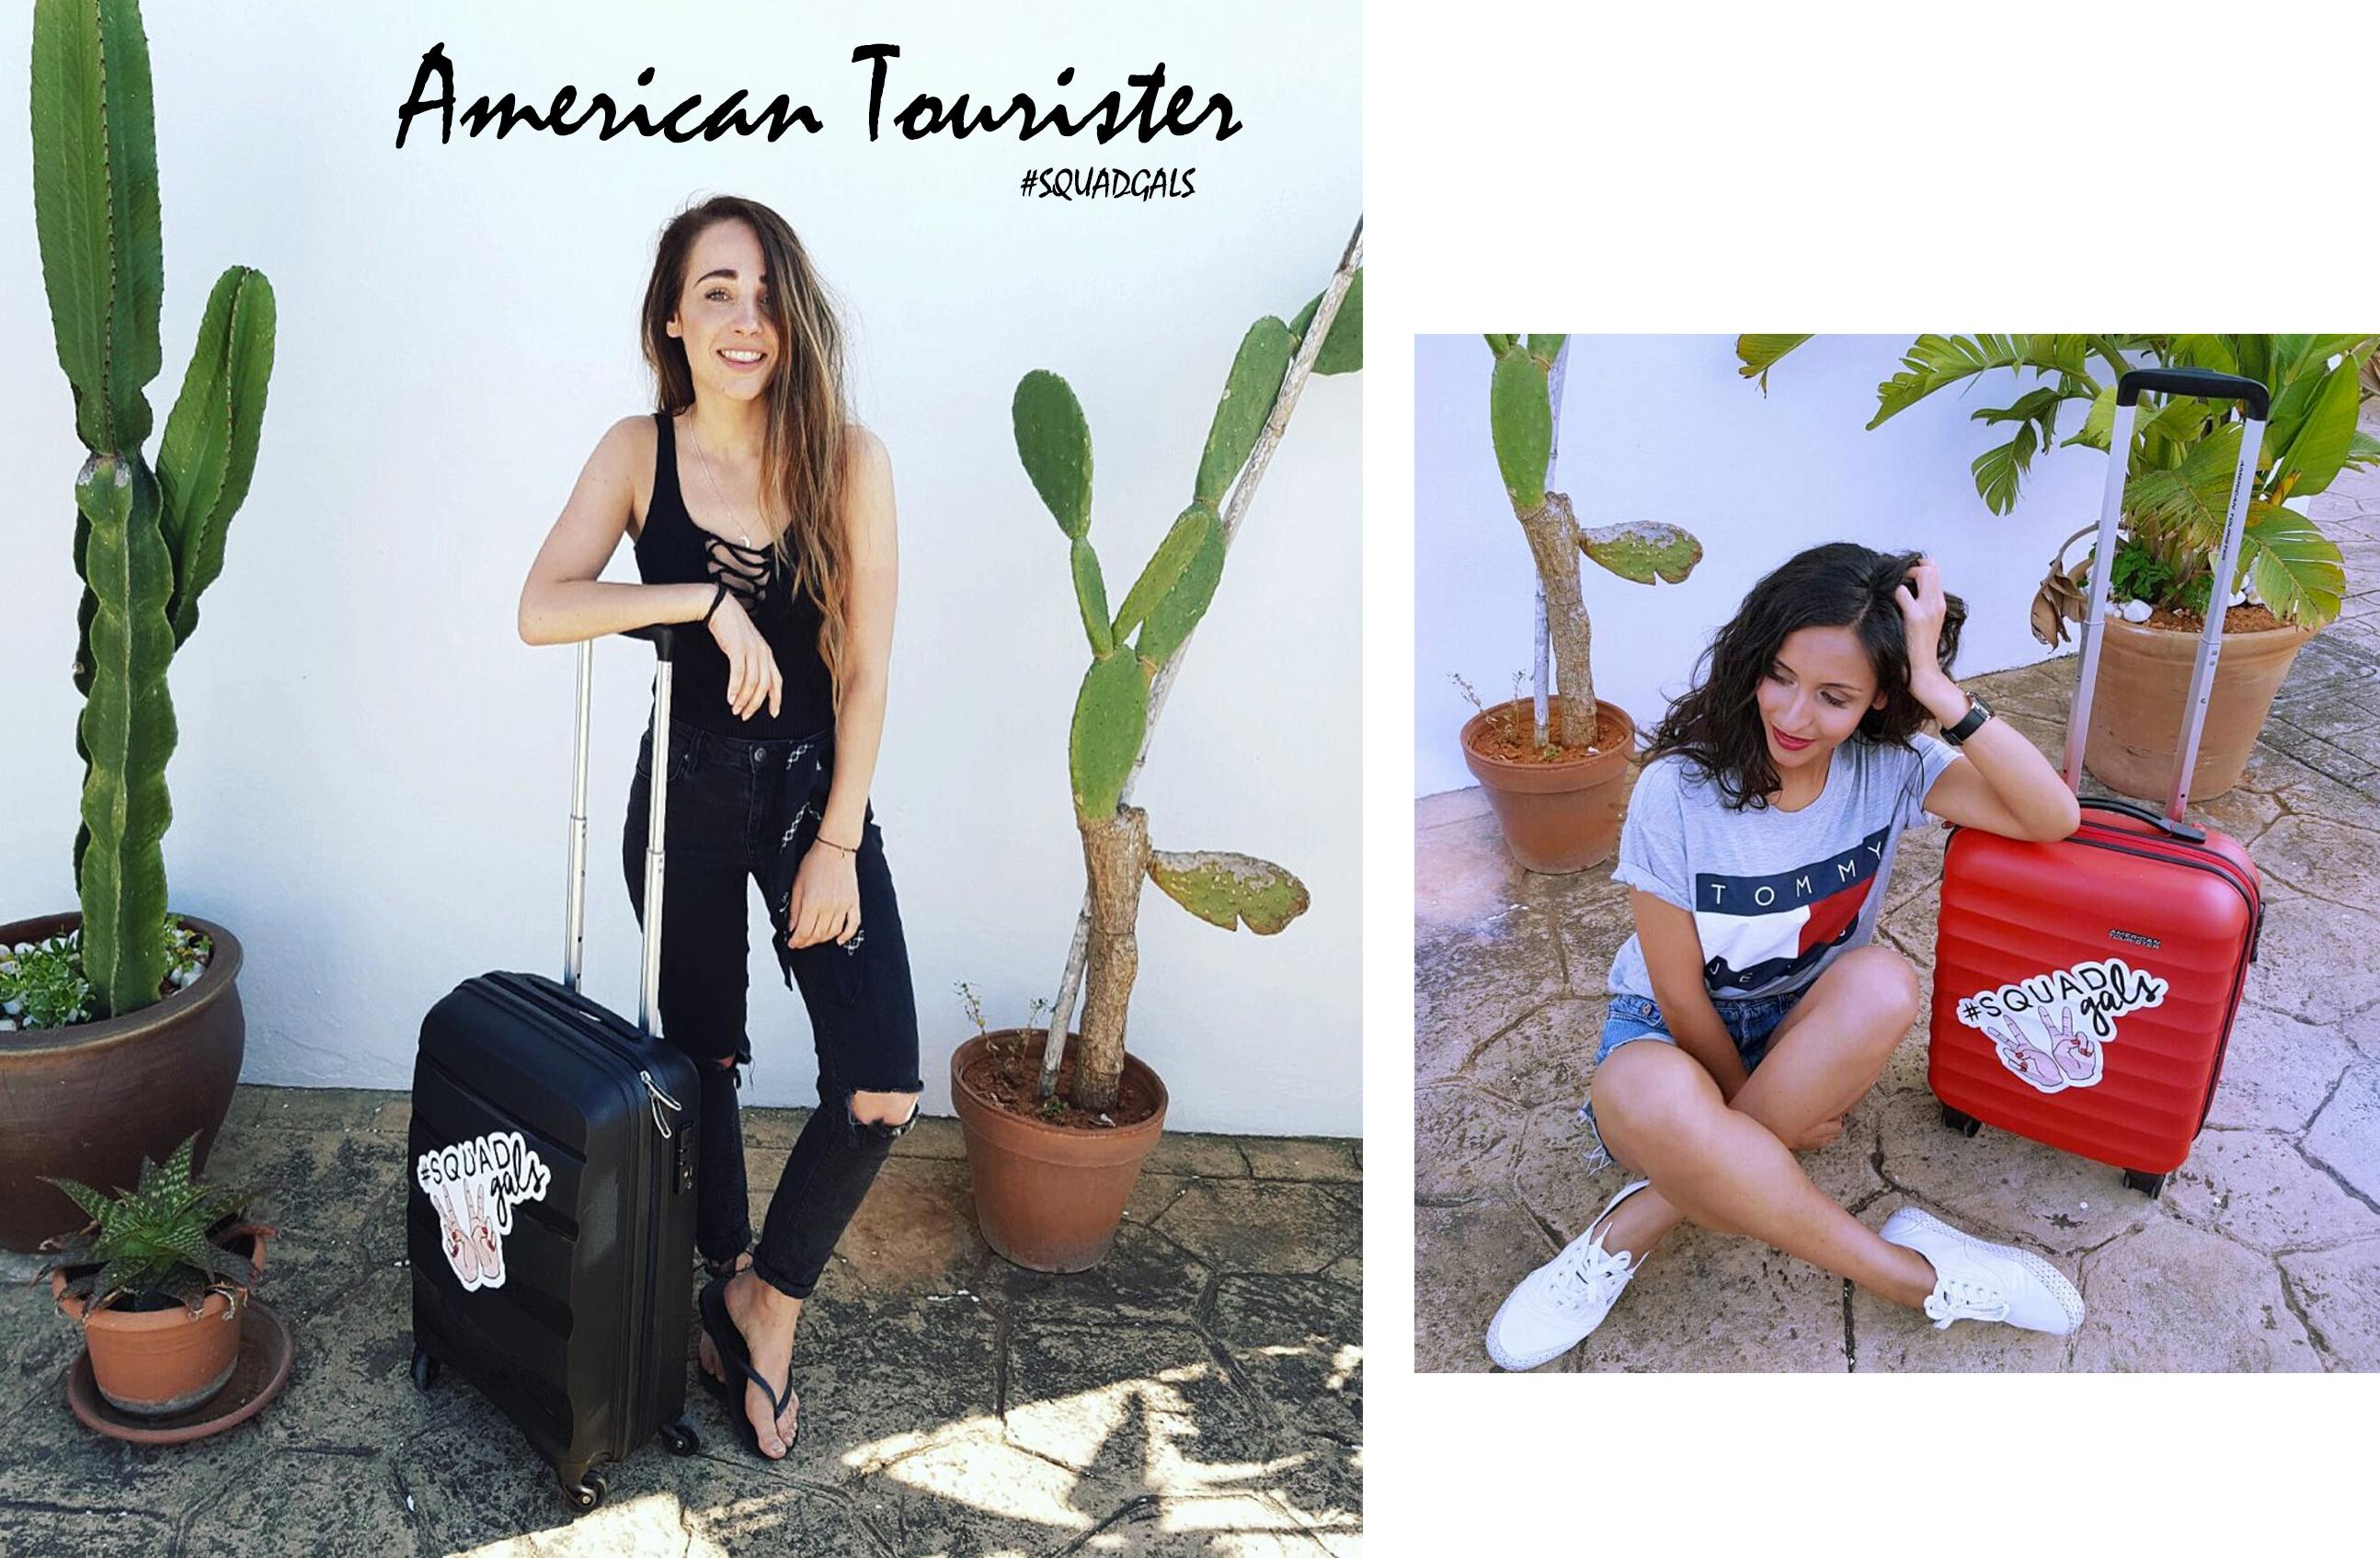 American Tourister x squadgals